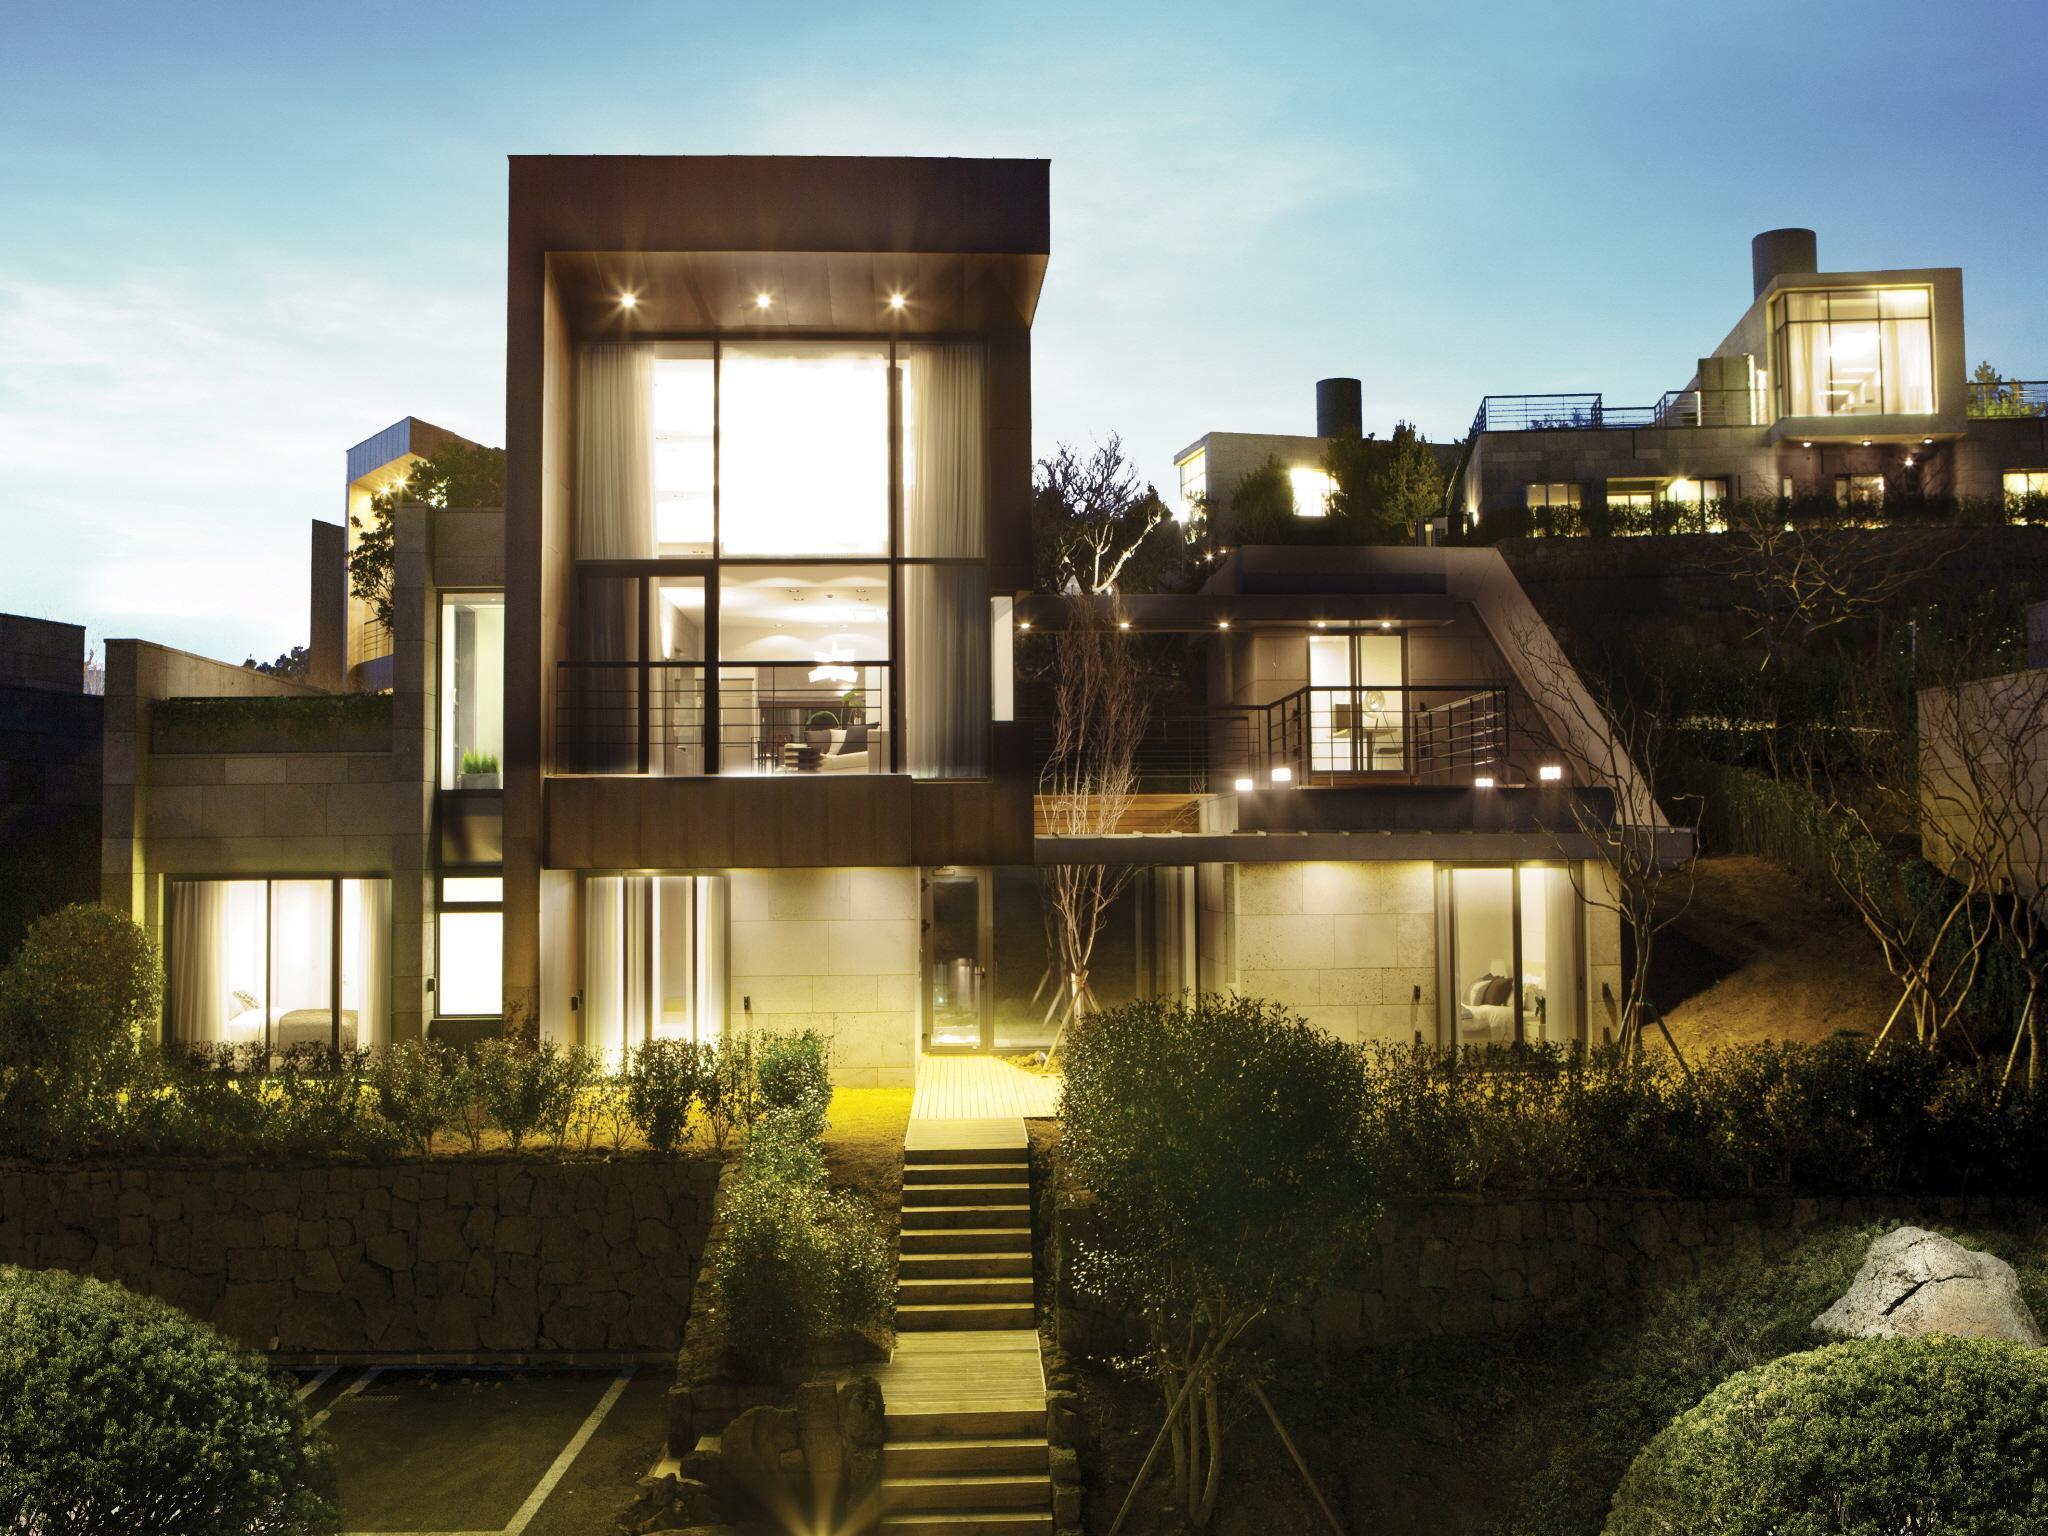 Best Price on Lotte Resort Jeju Art Villas in Jeju Island